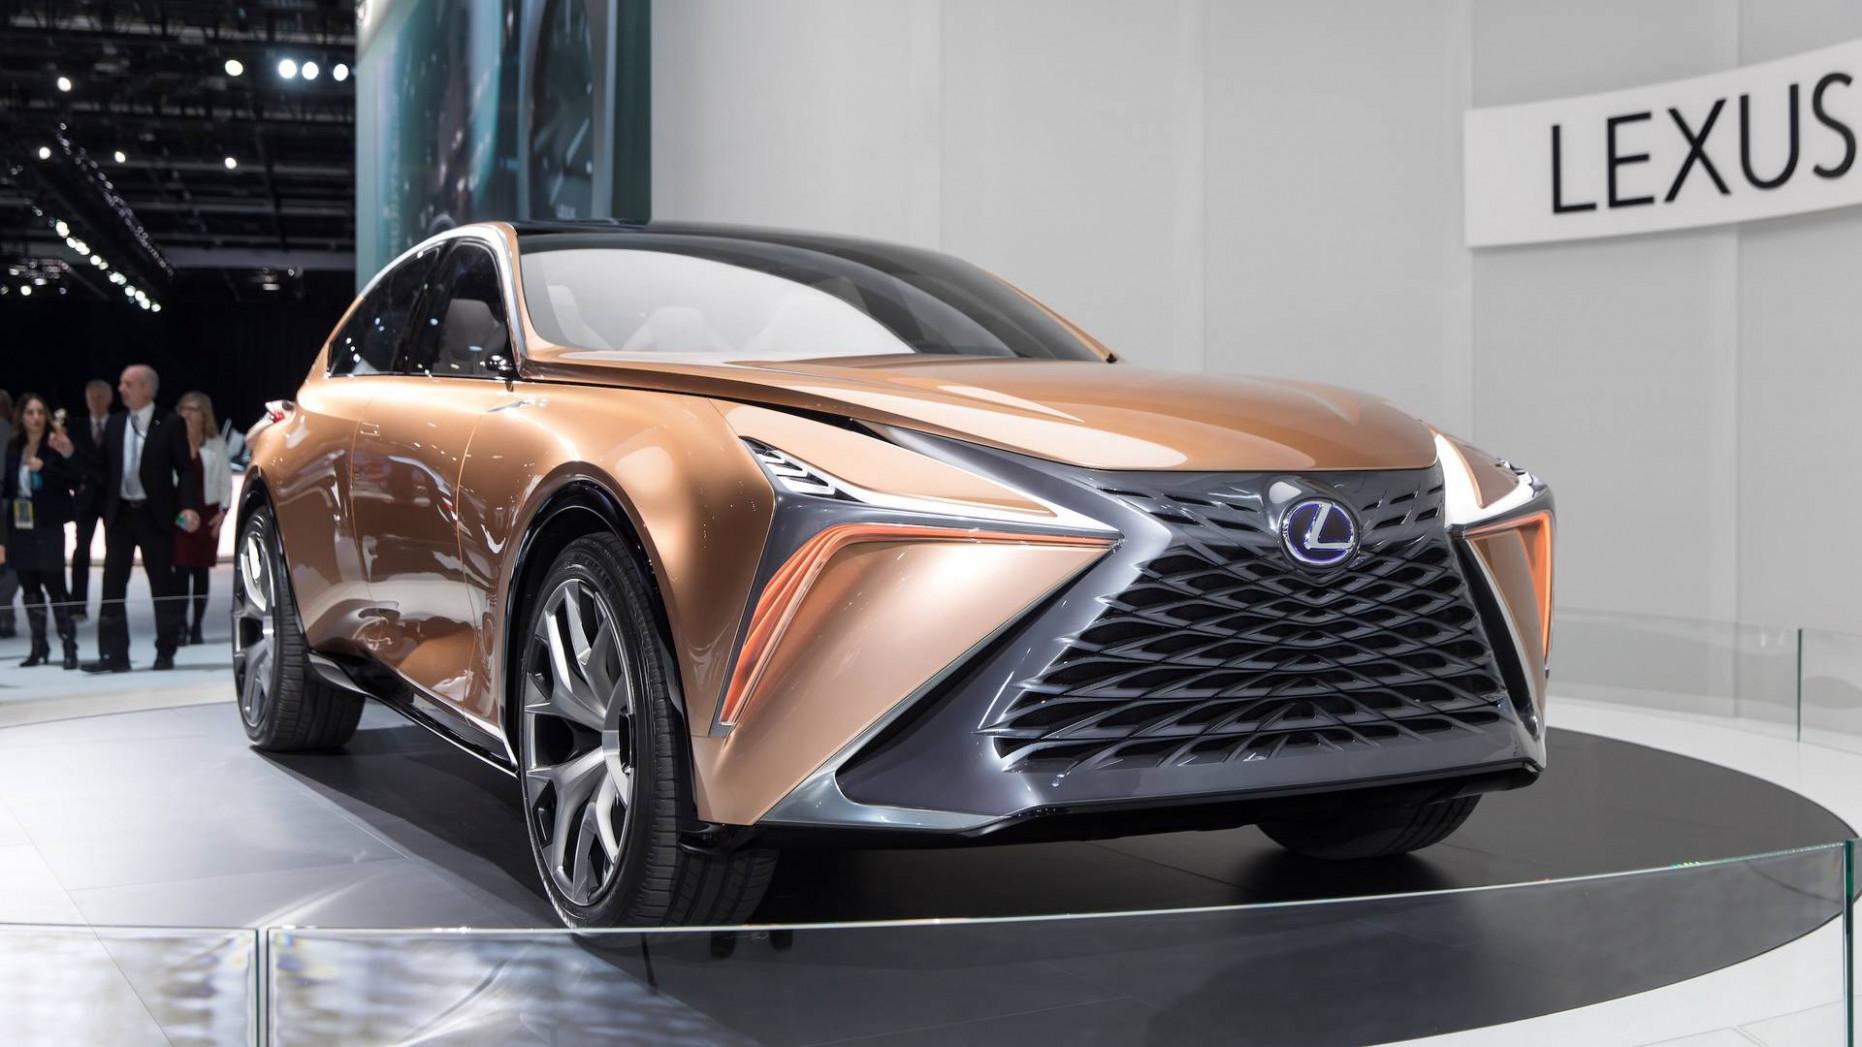 Performance and New Engine 2022 Lexus Ls 500 V8